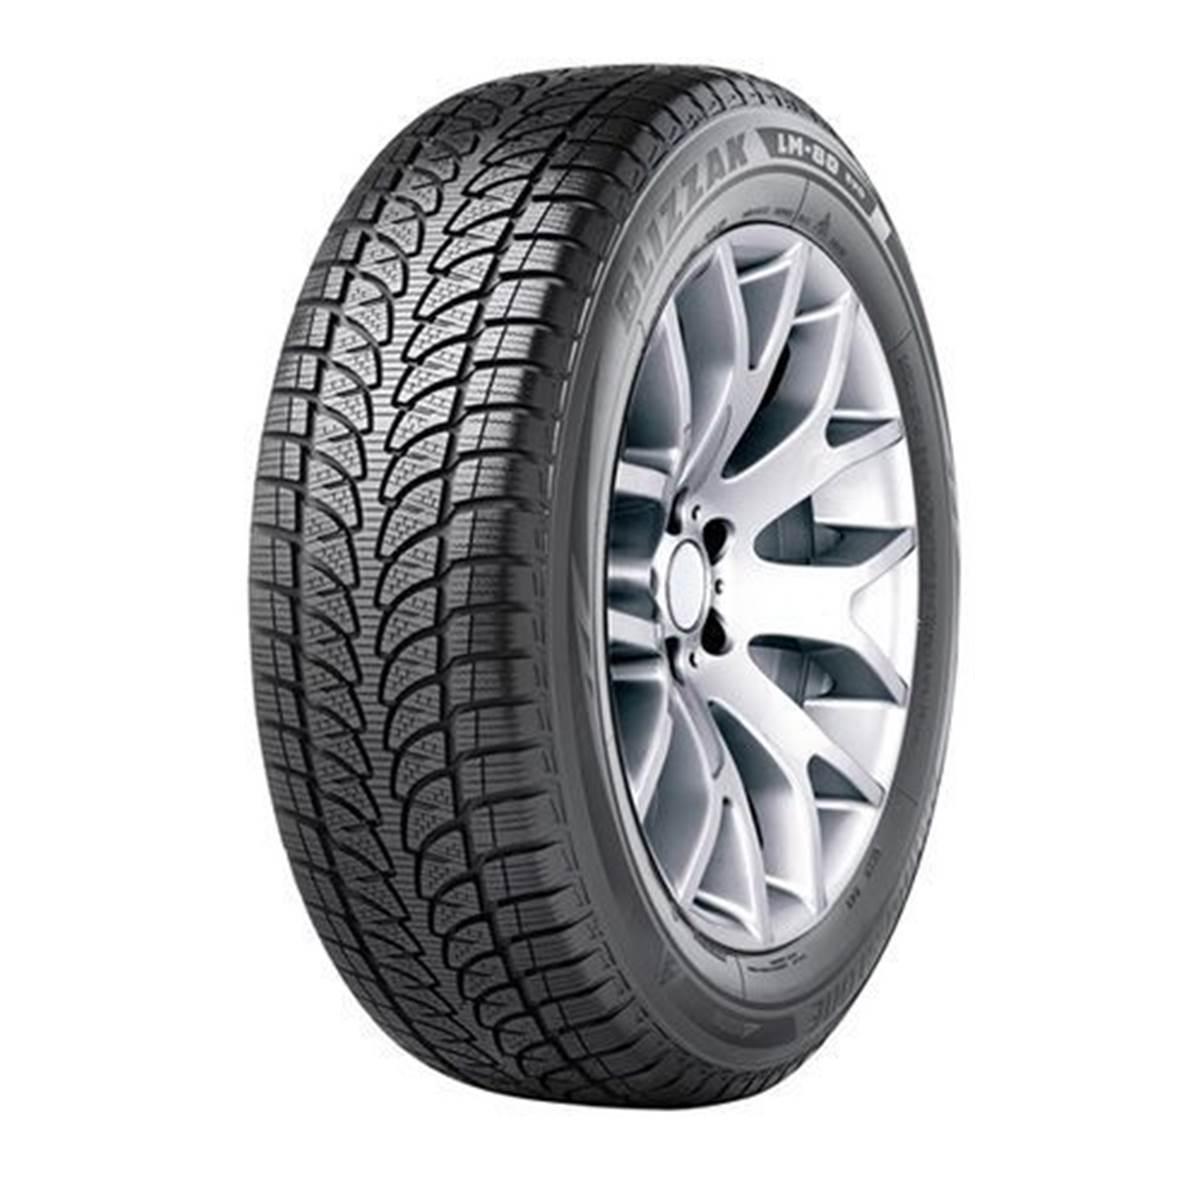 Pneu 4X4 Hiver Bridgestone 225/70R16 103T Blizzak Lm80